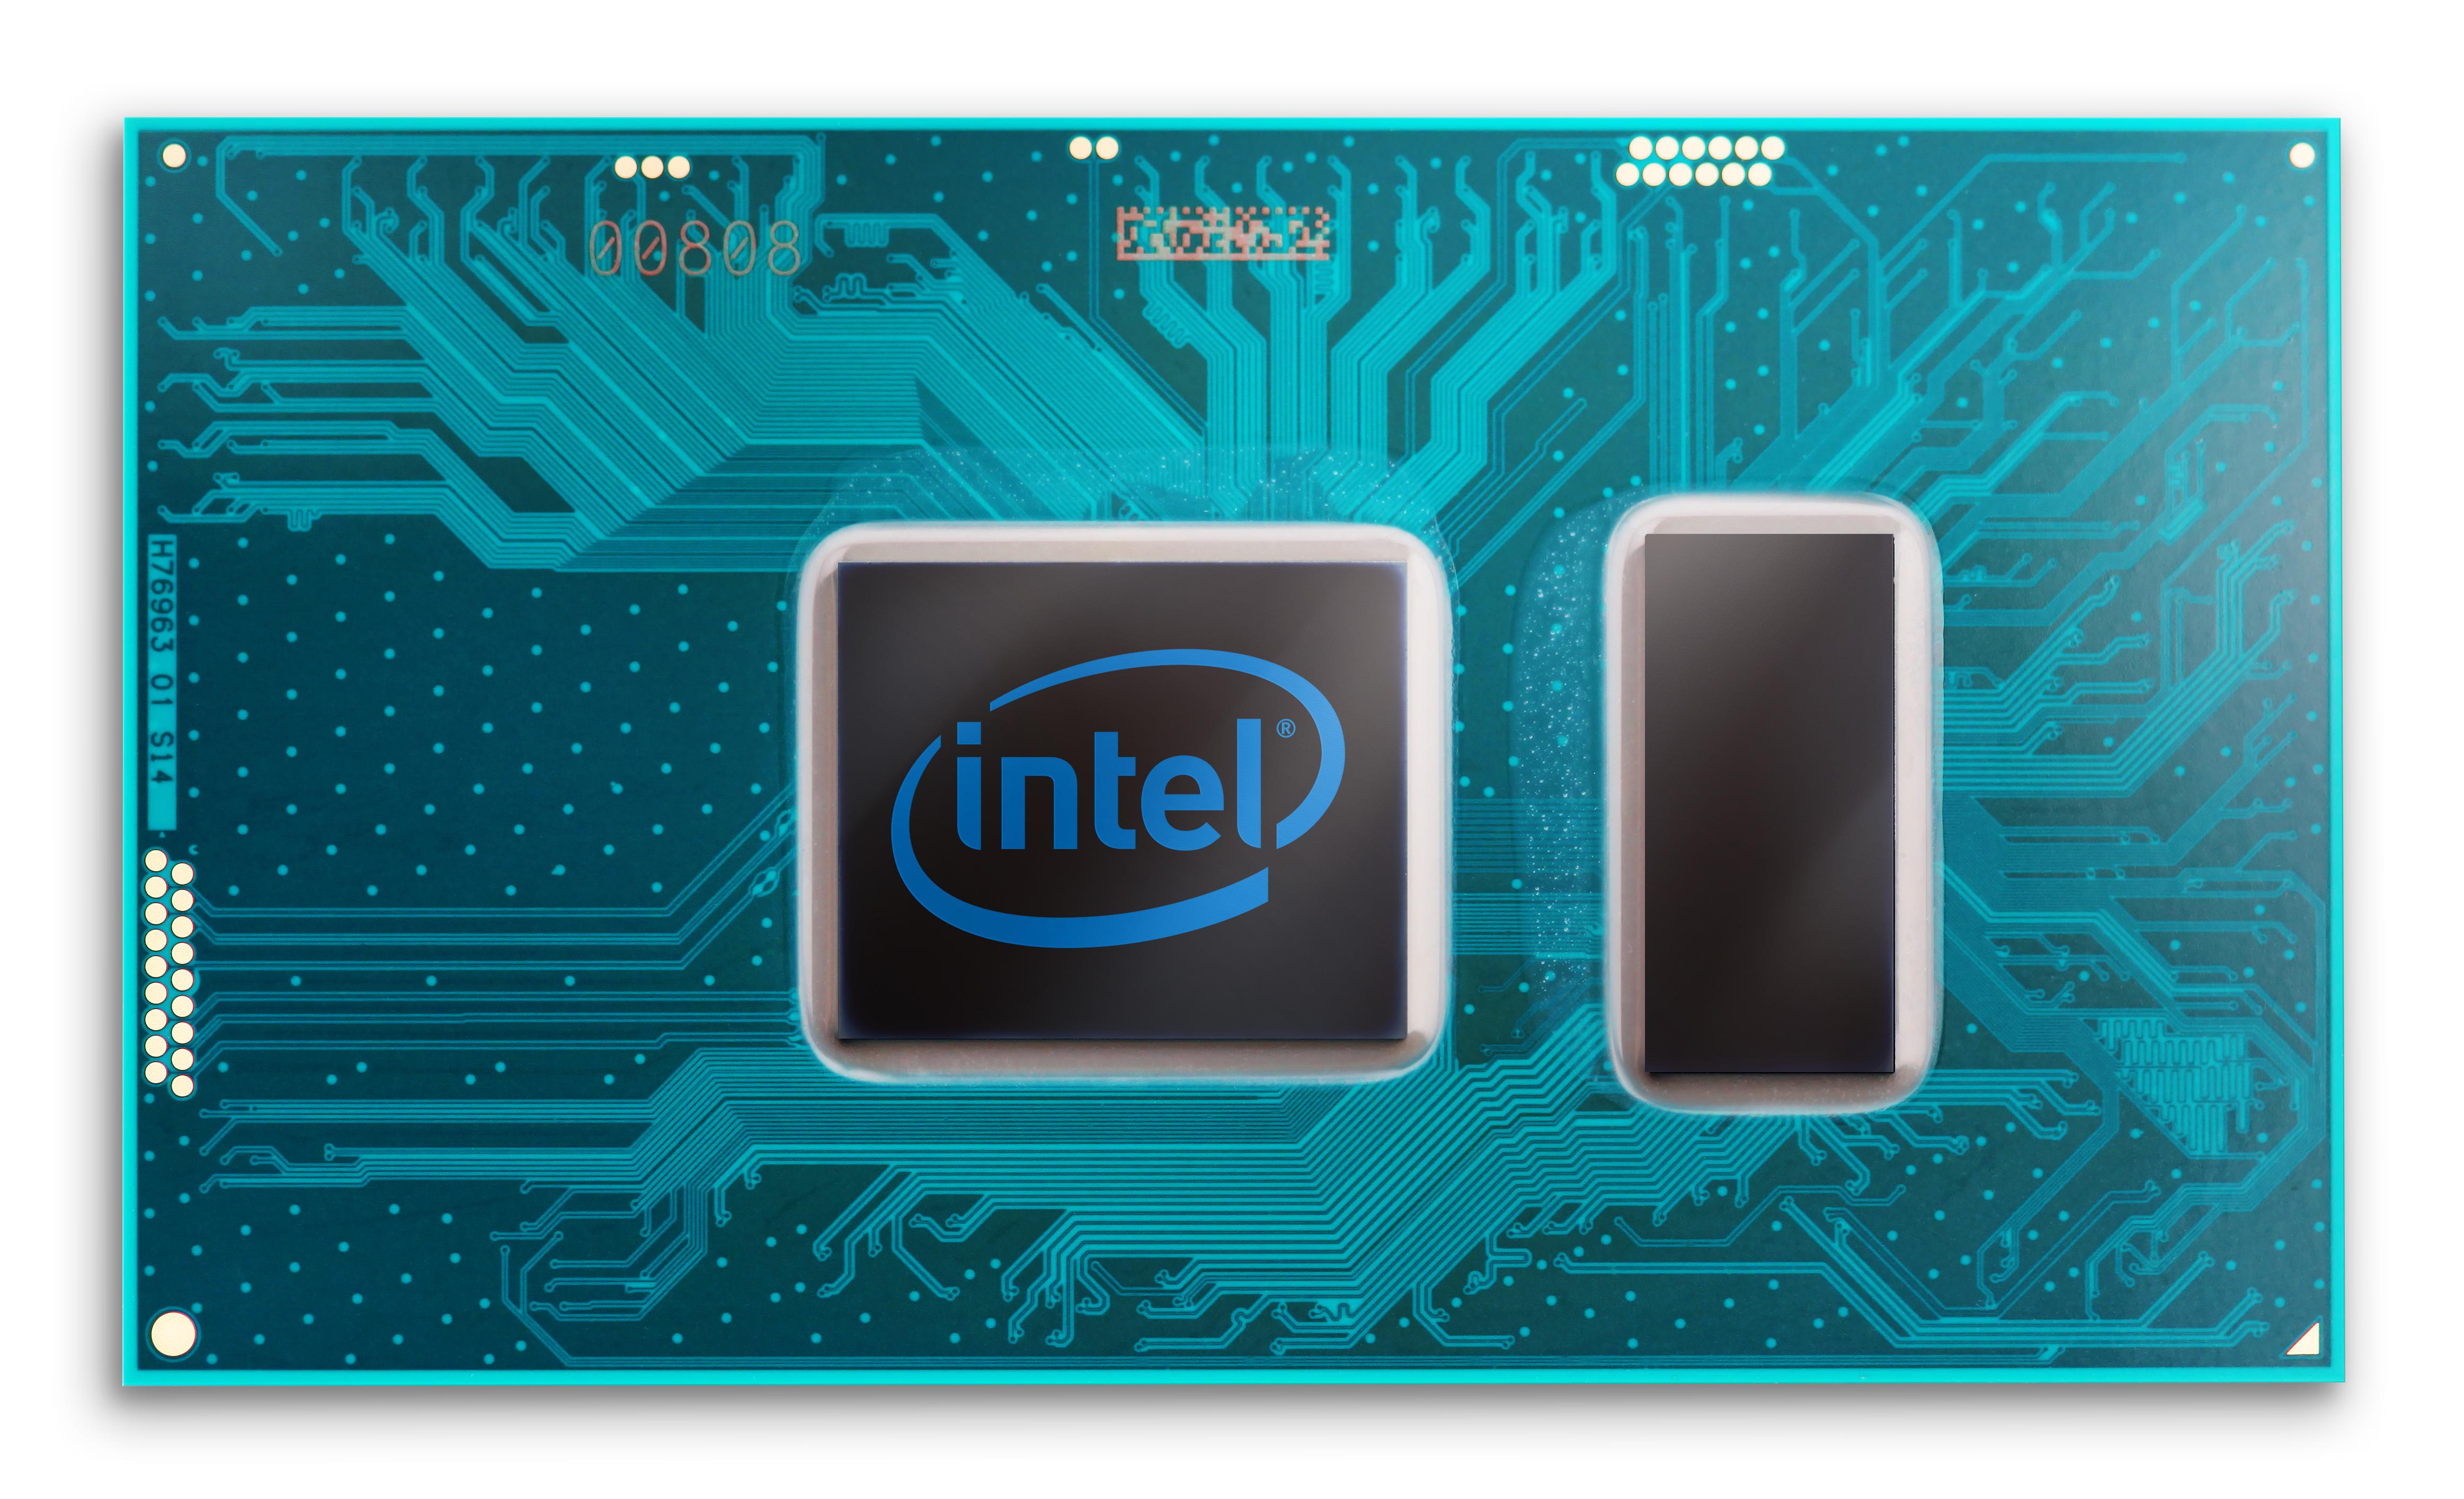 7th Gen Intel Core U-series with logo